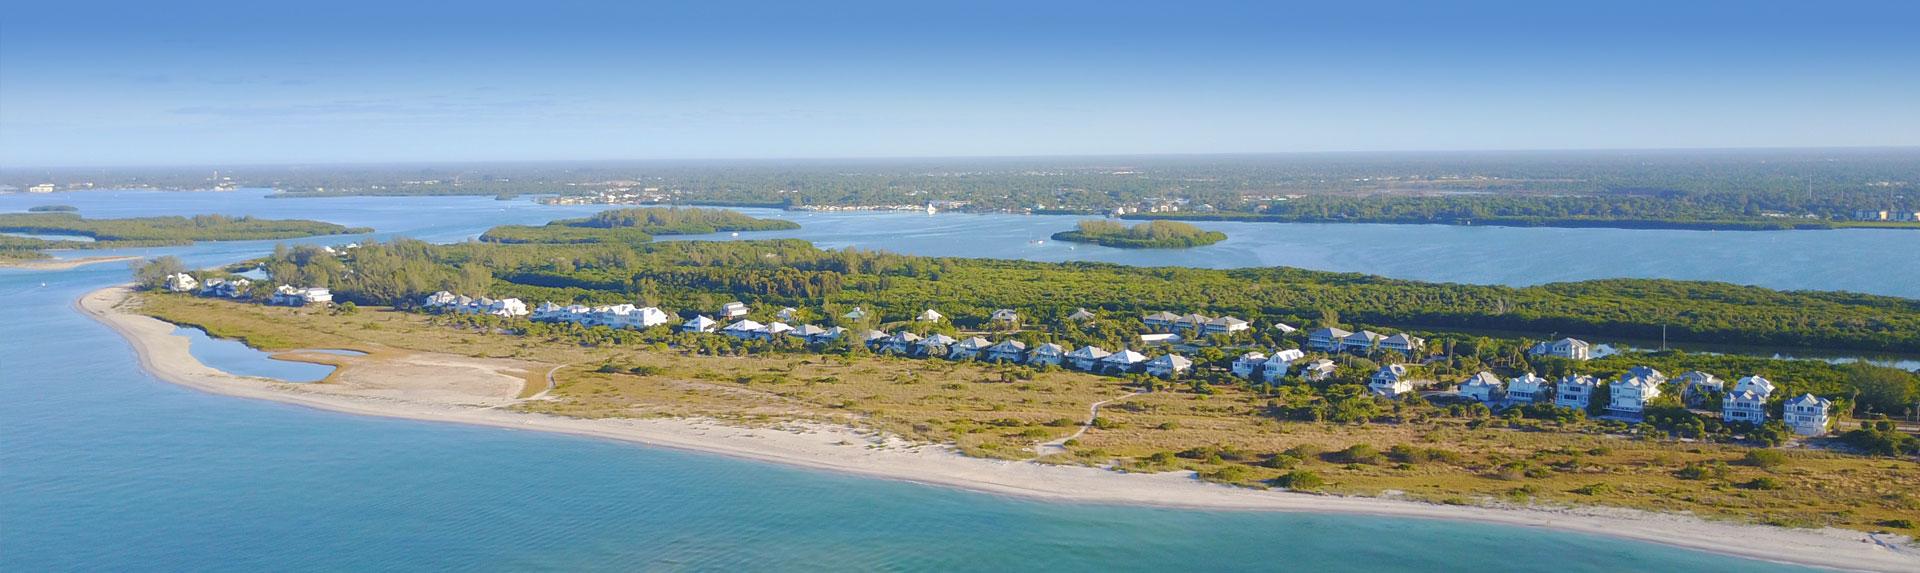 about-us-palm-island-properties